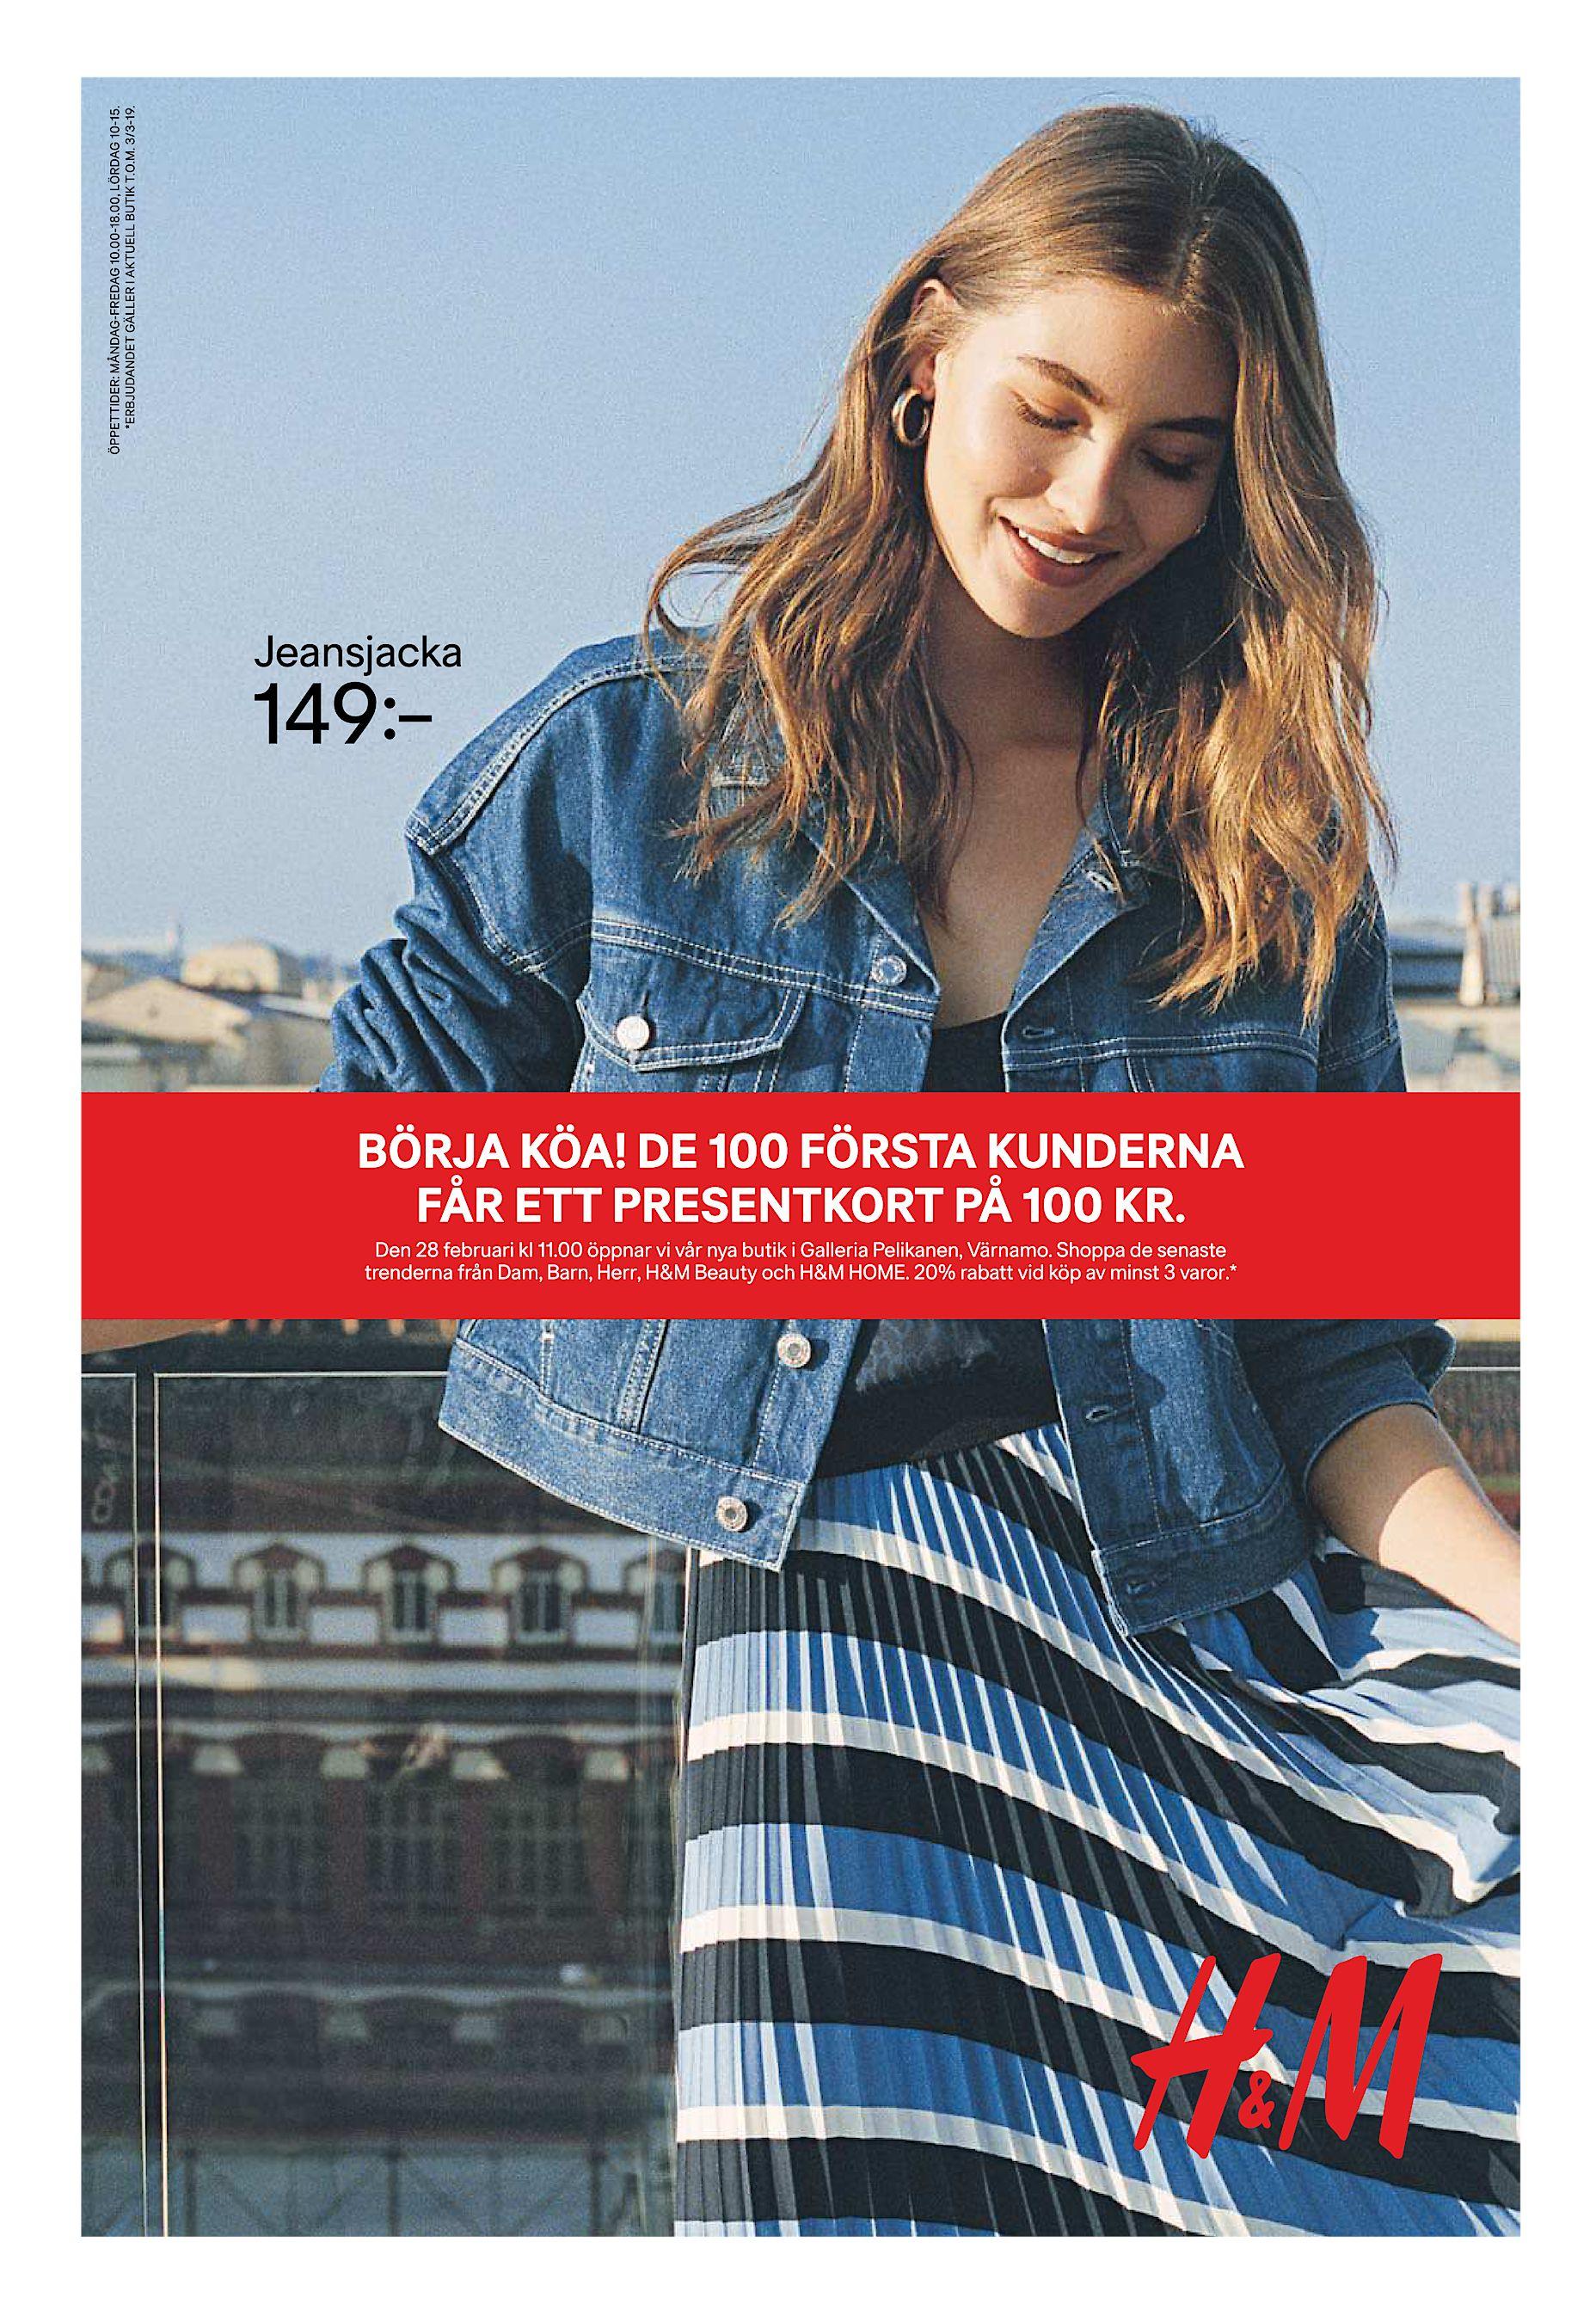 f99192eb381f Finnveden.nu FNU-20190227 (endast text)